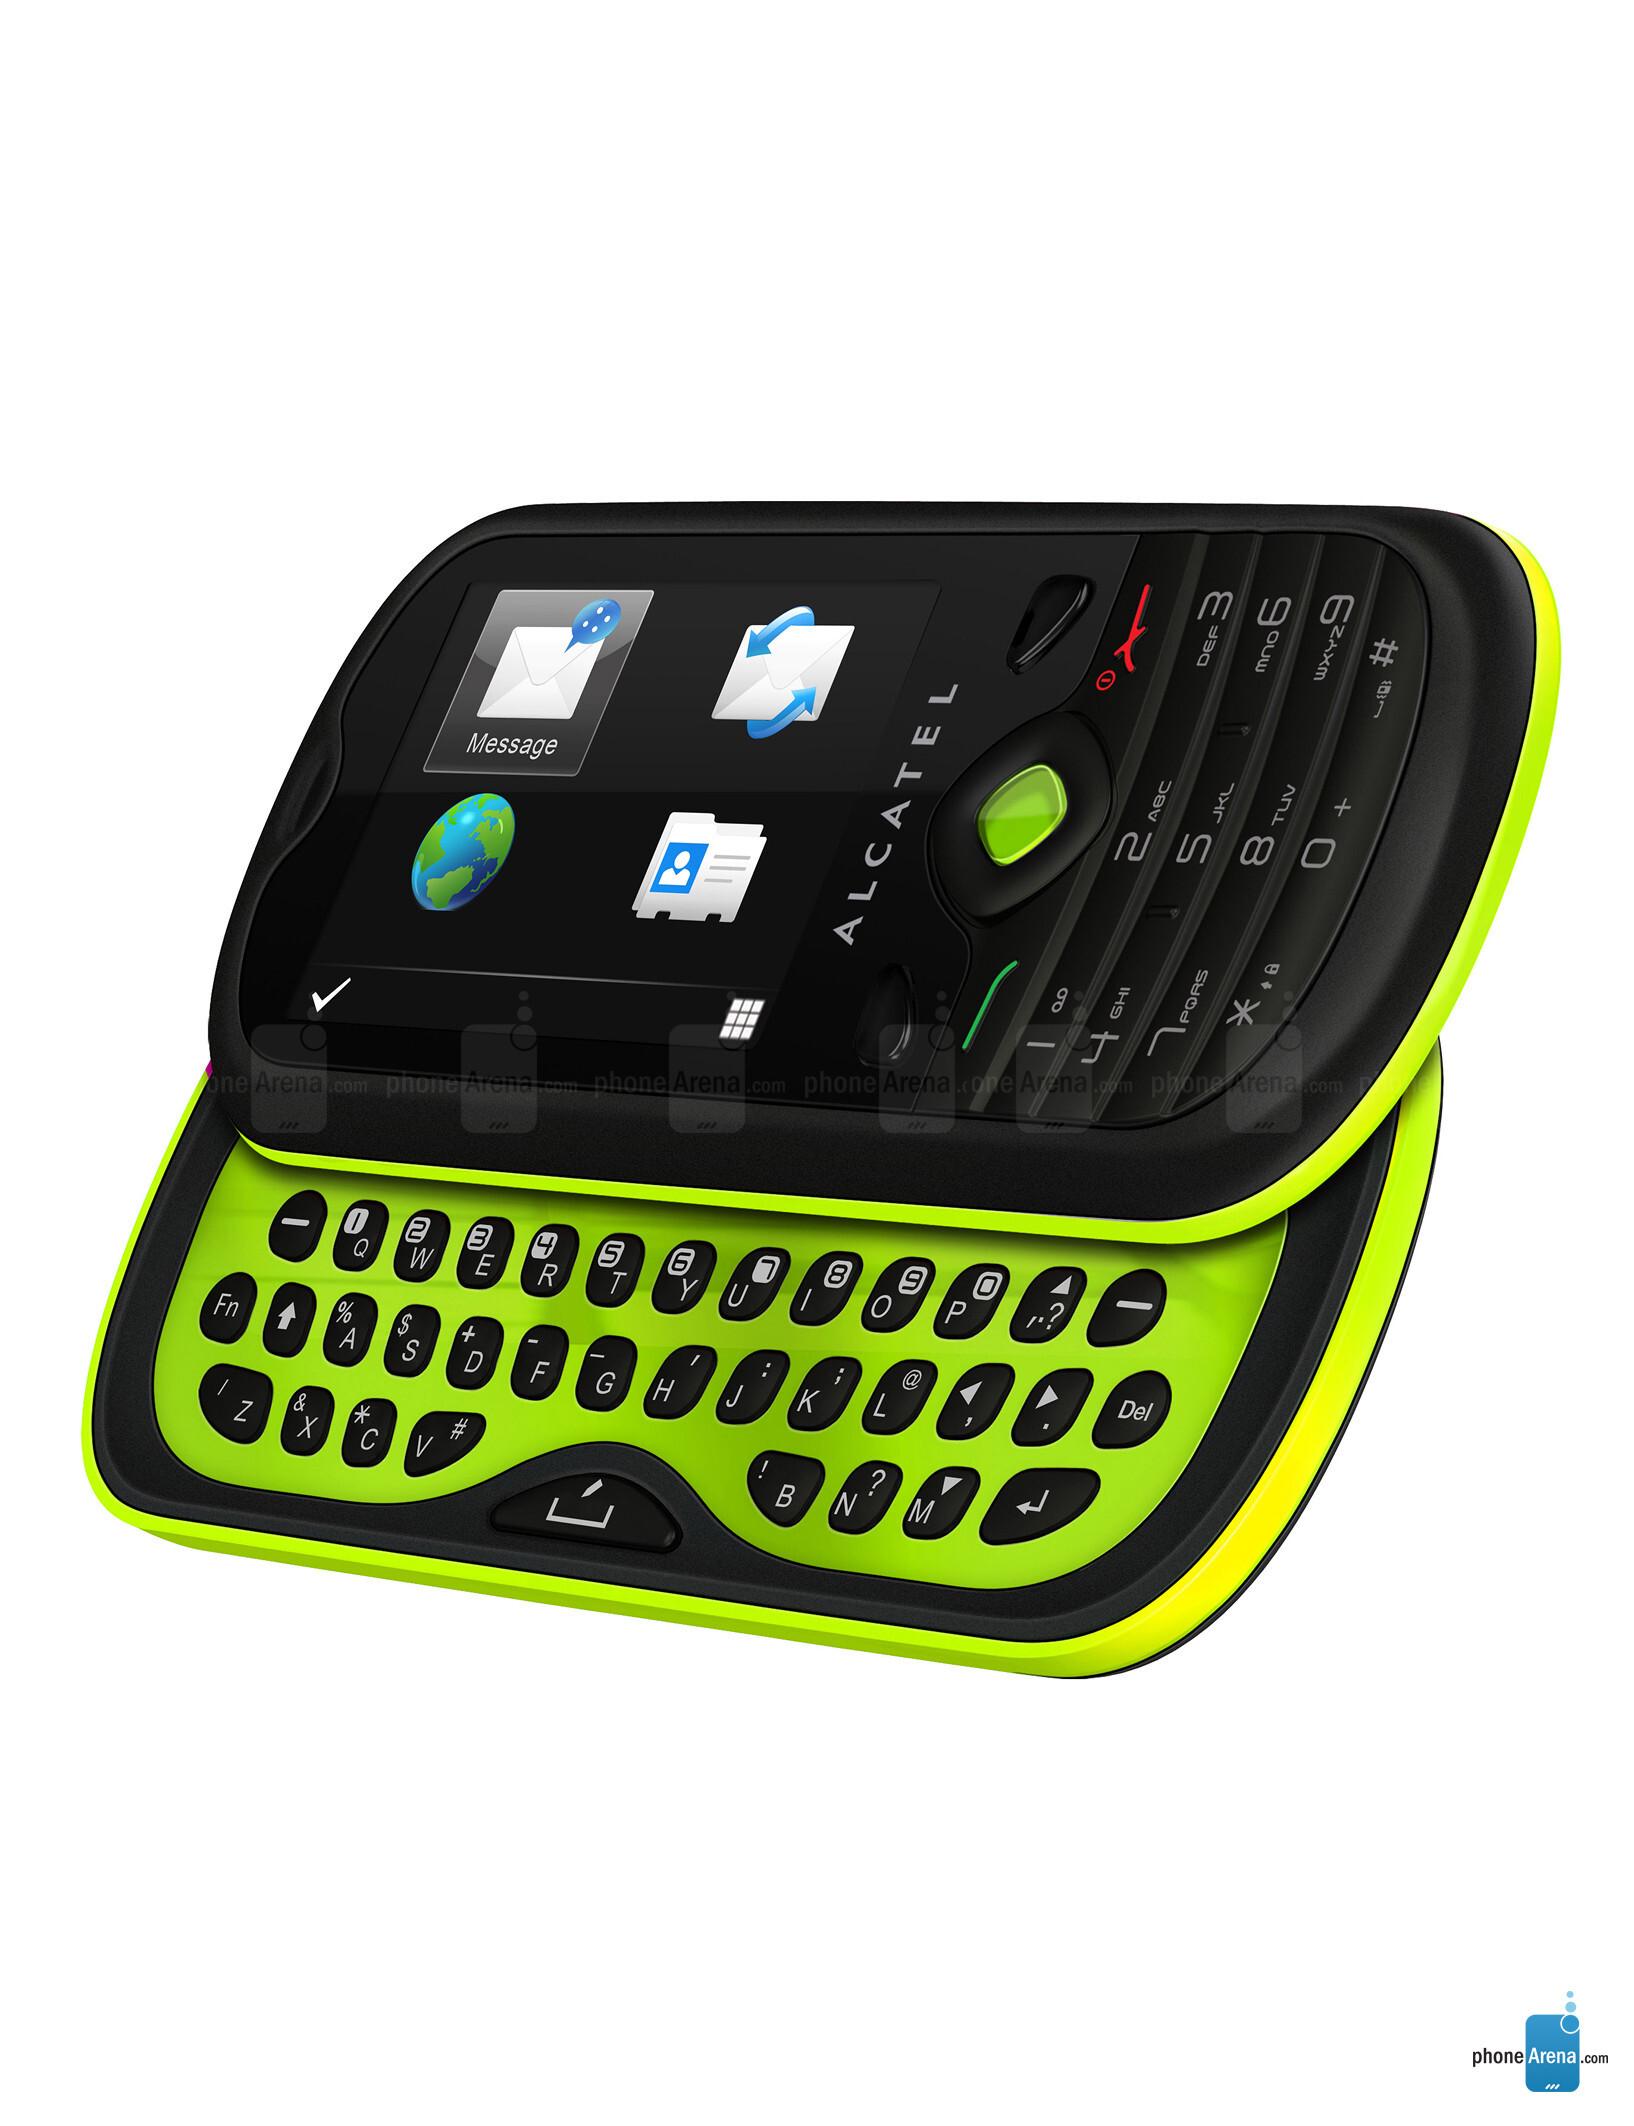 t mobile sparq photos rh phonearena com T-Mobile SPARQ Sim Card t-mobile sparq ii manual